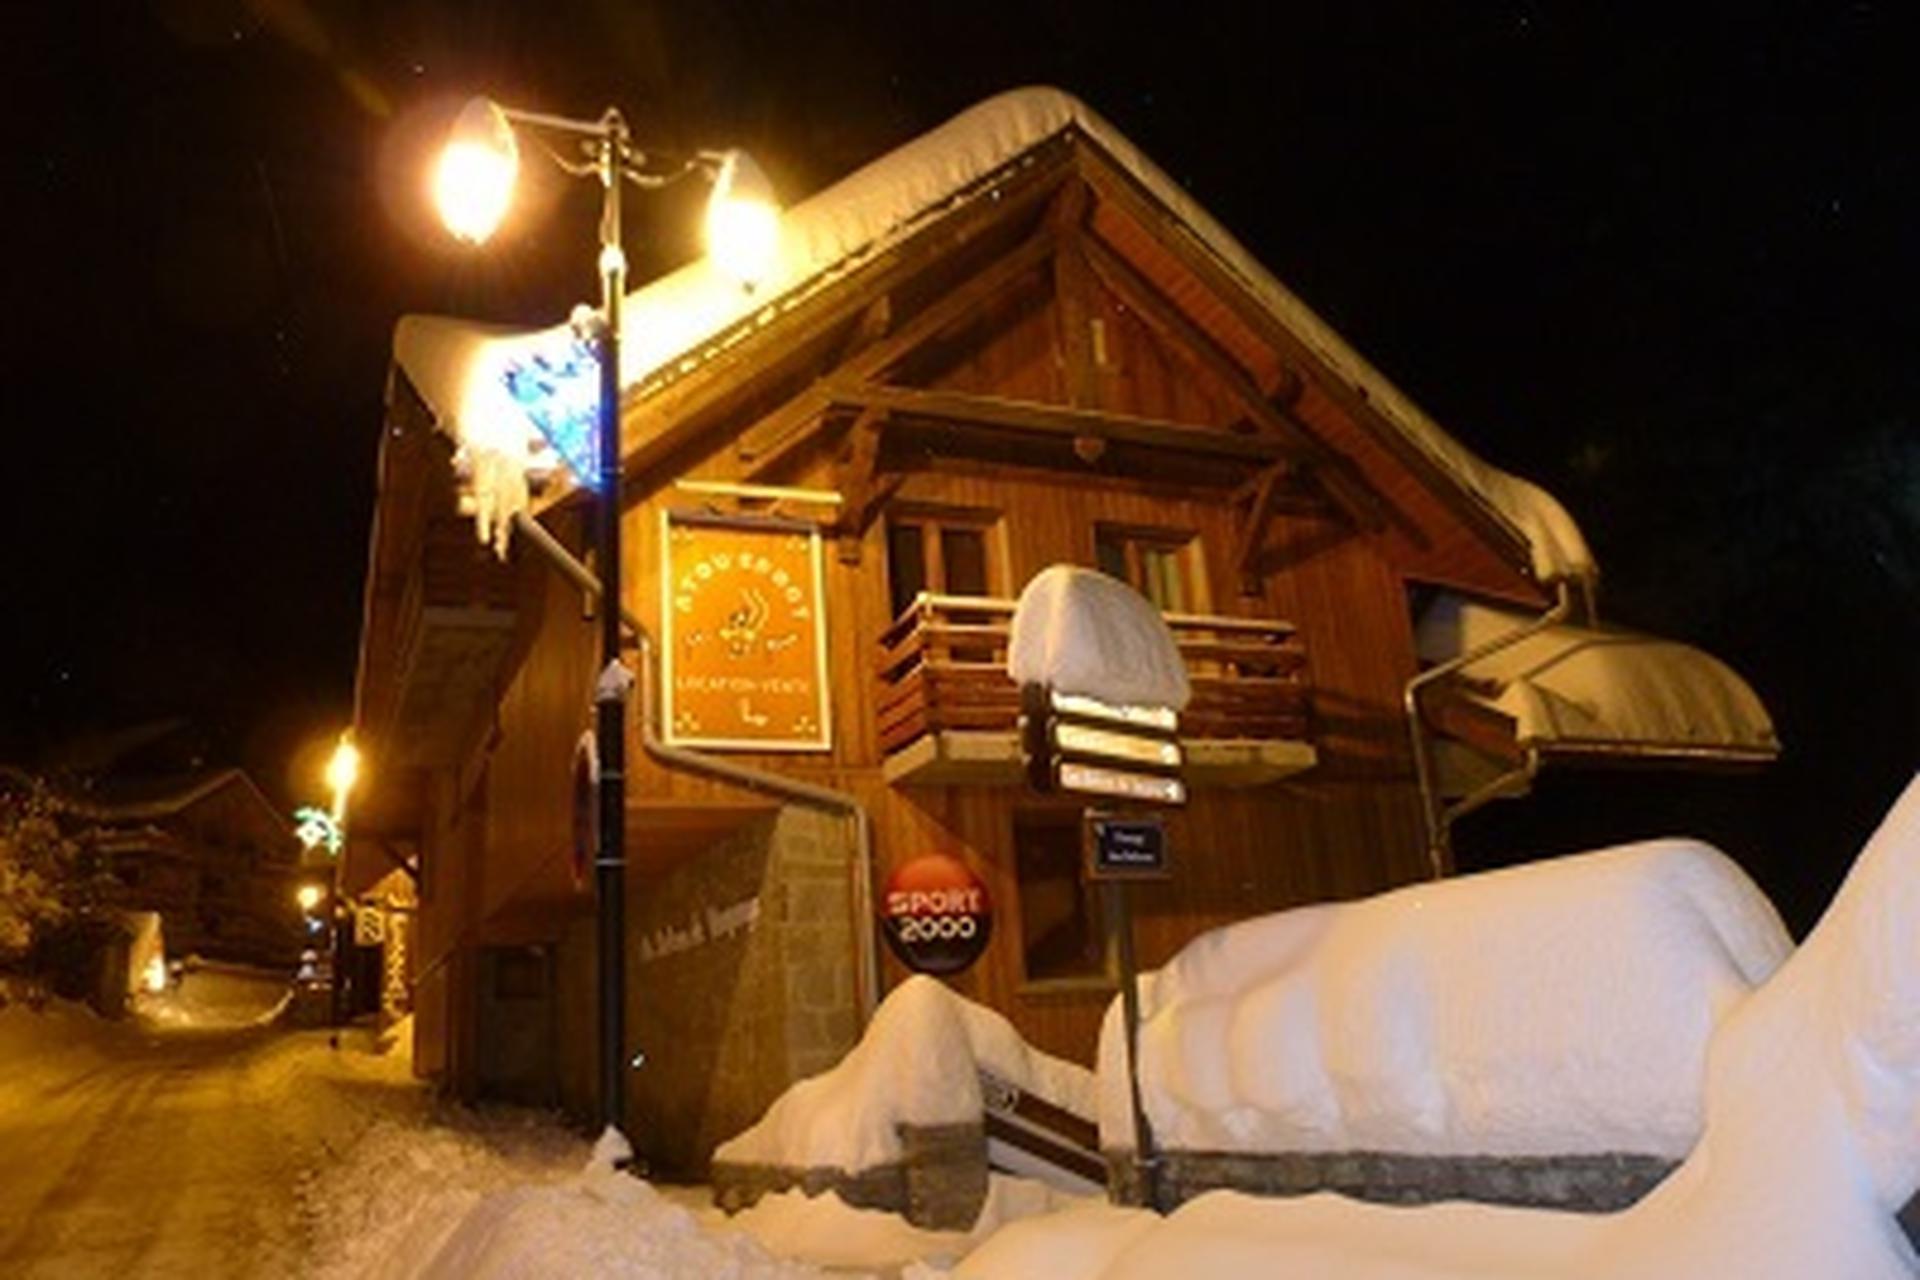 Les Balcons de Vaujany - Tomorrowland Winter - Alpe d'Huez